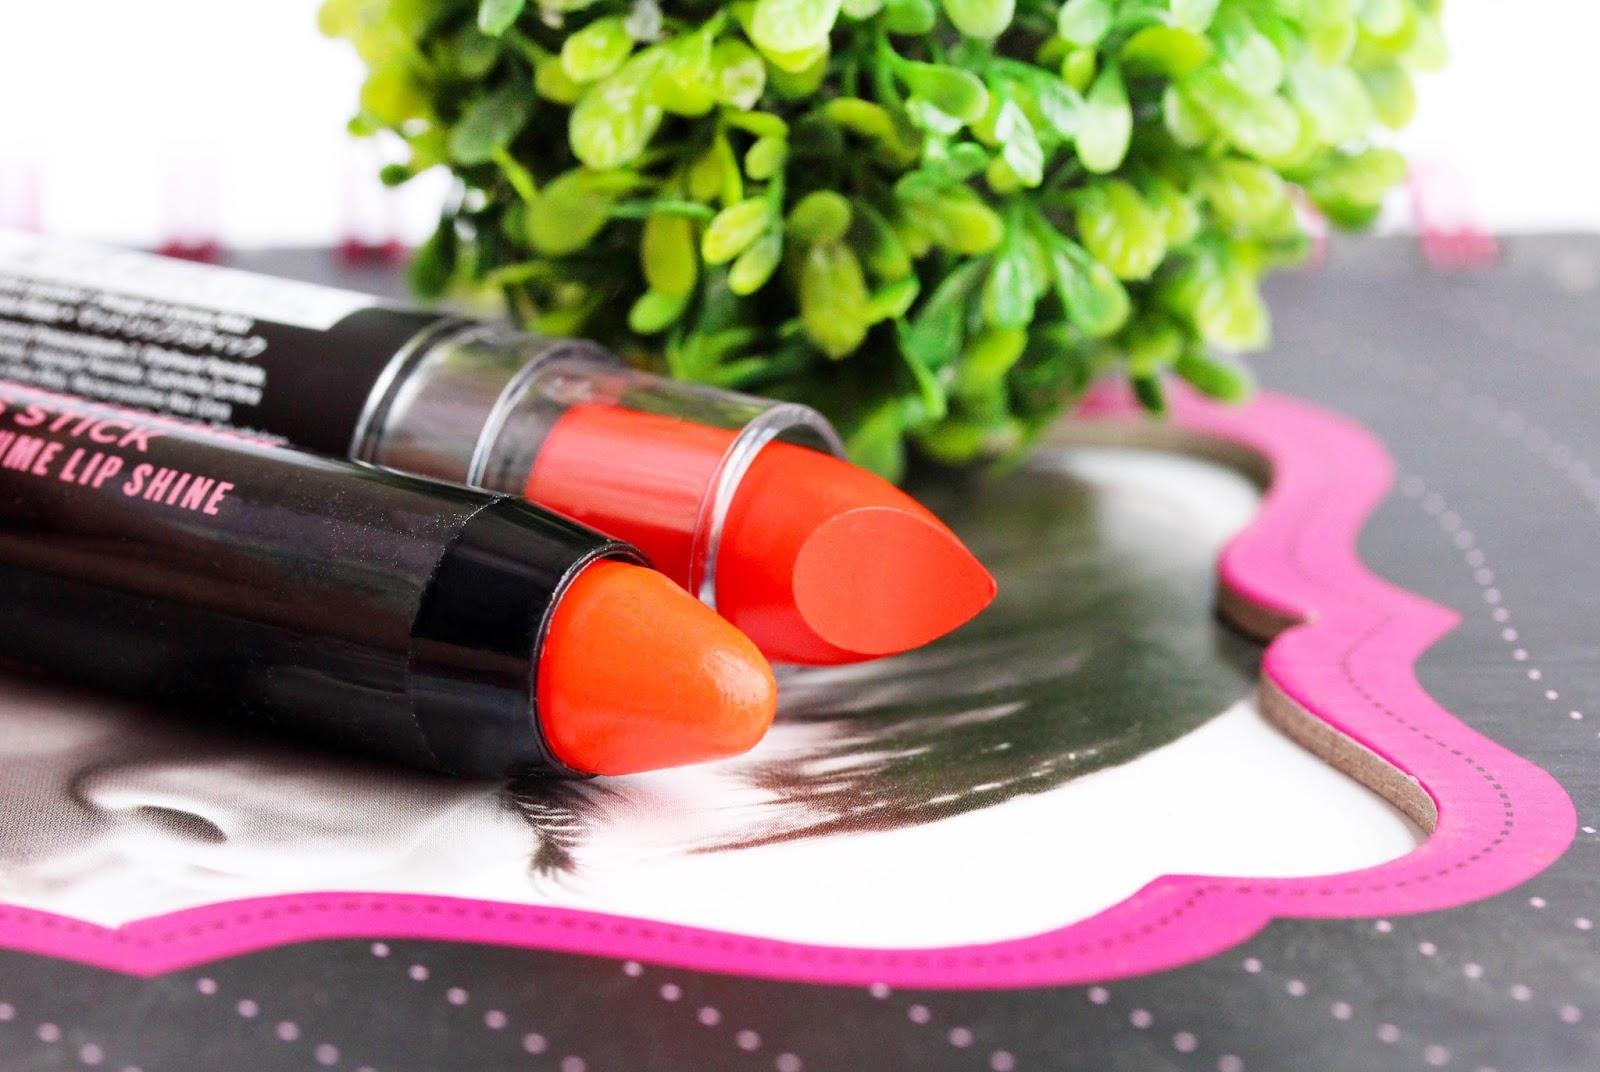 NYX Matte Lipstick in Indie Flick and Soap & Glory Fuchsia-Ristic